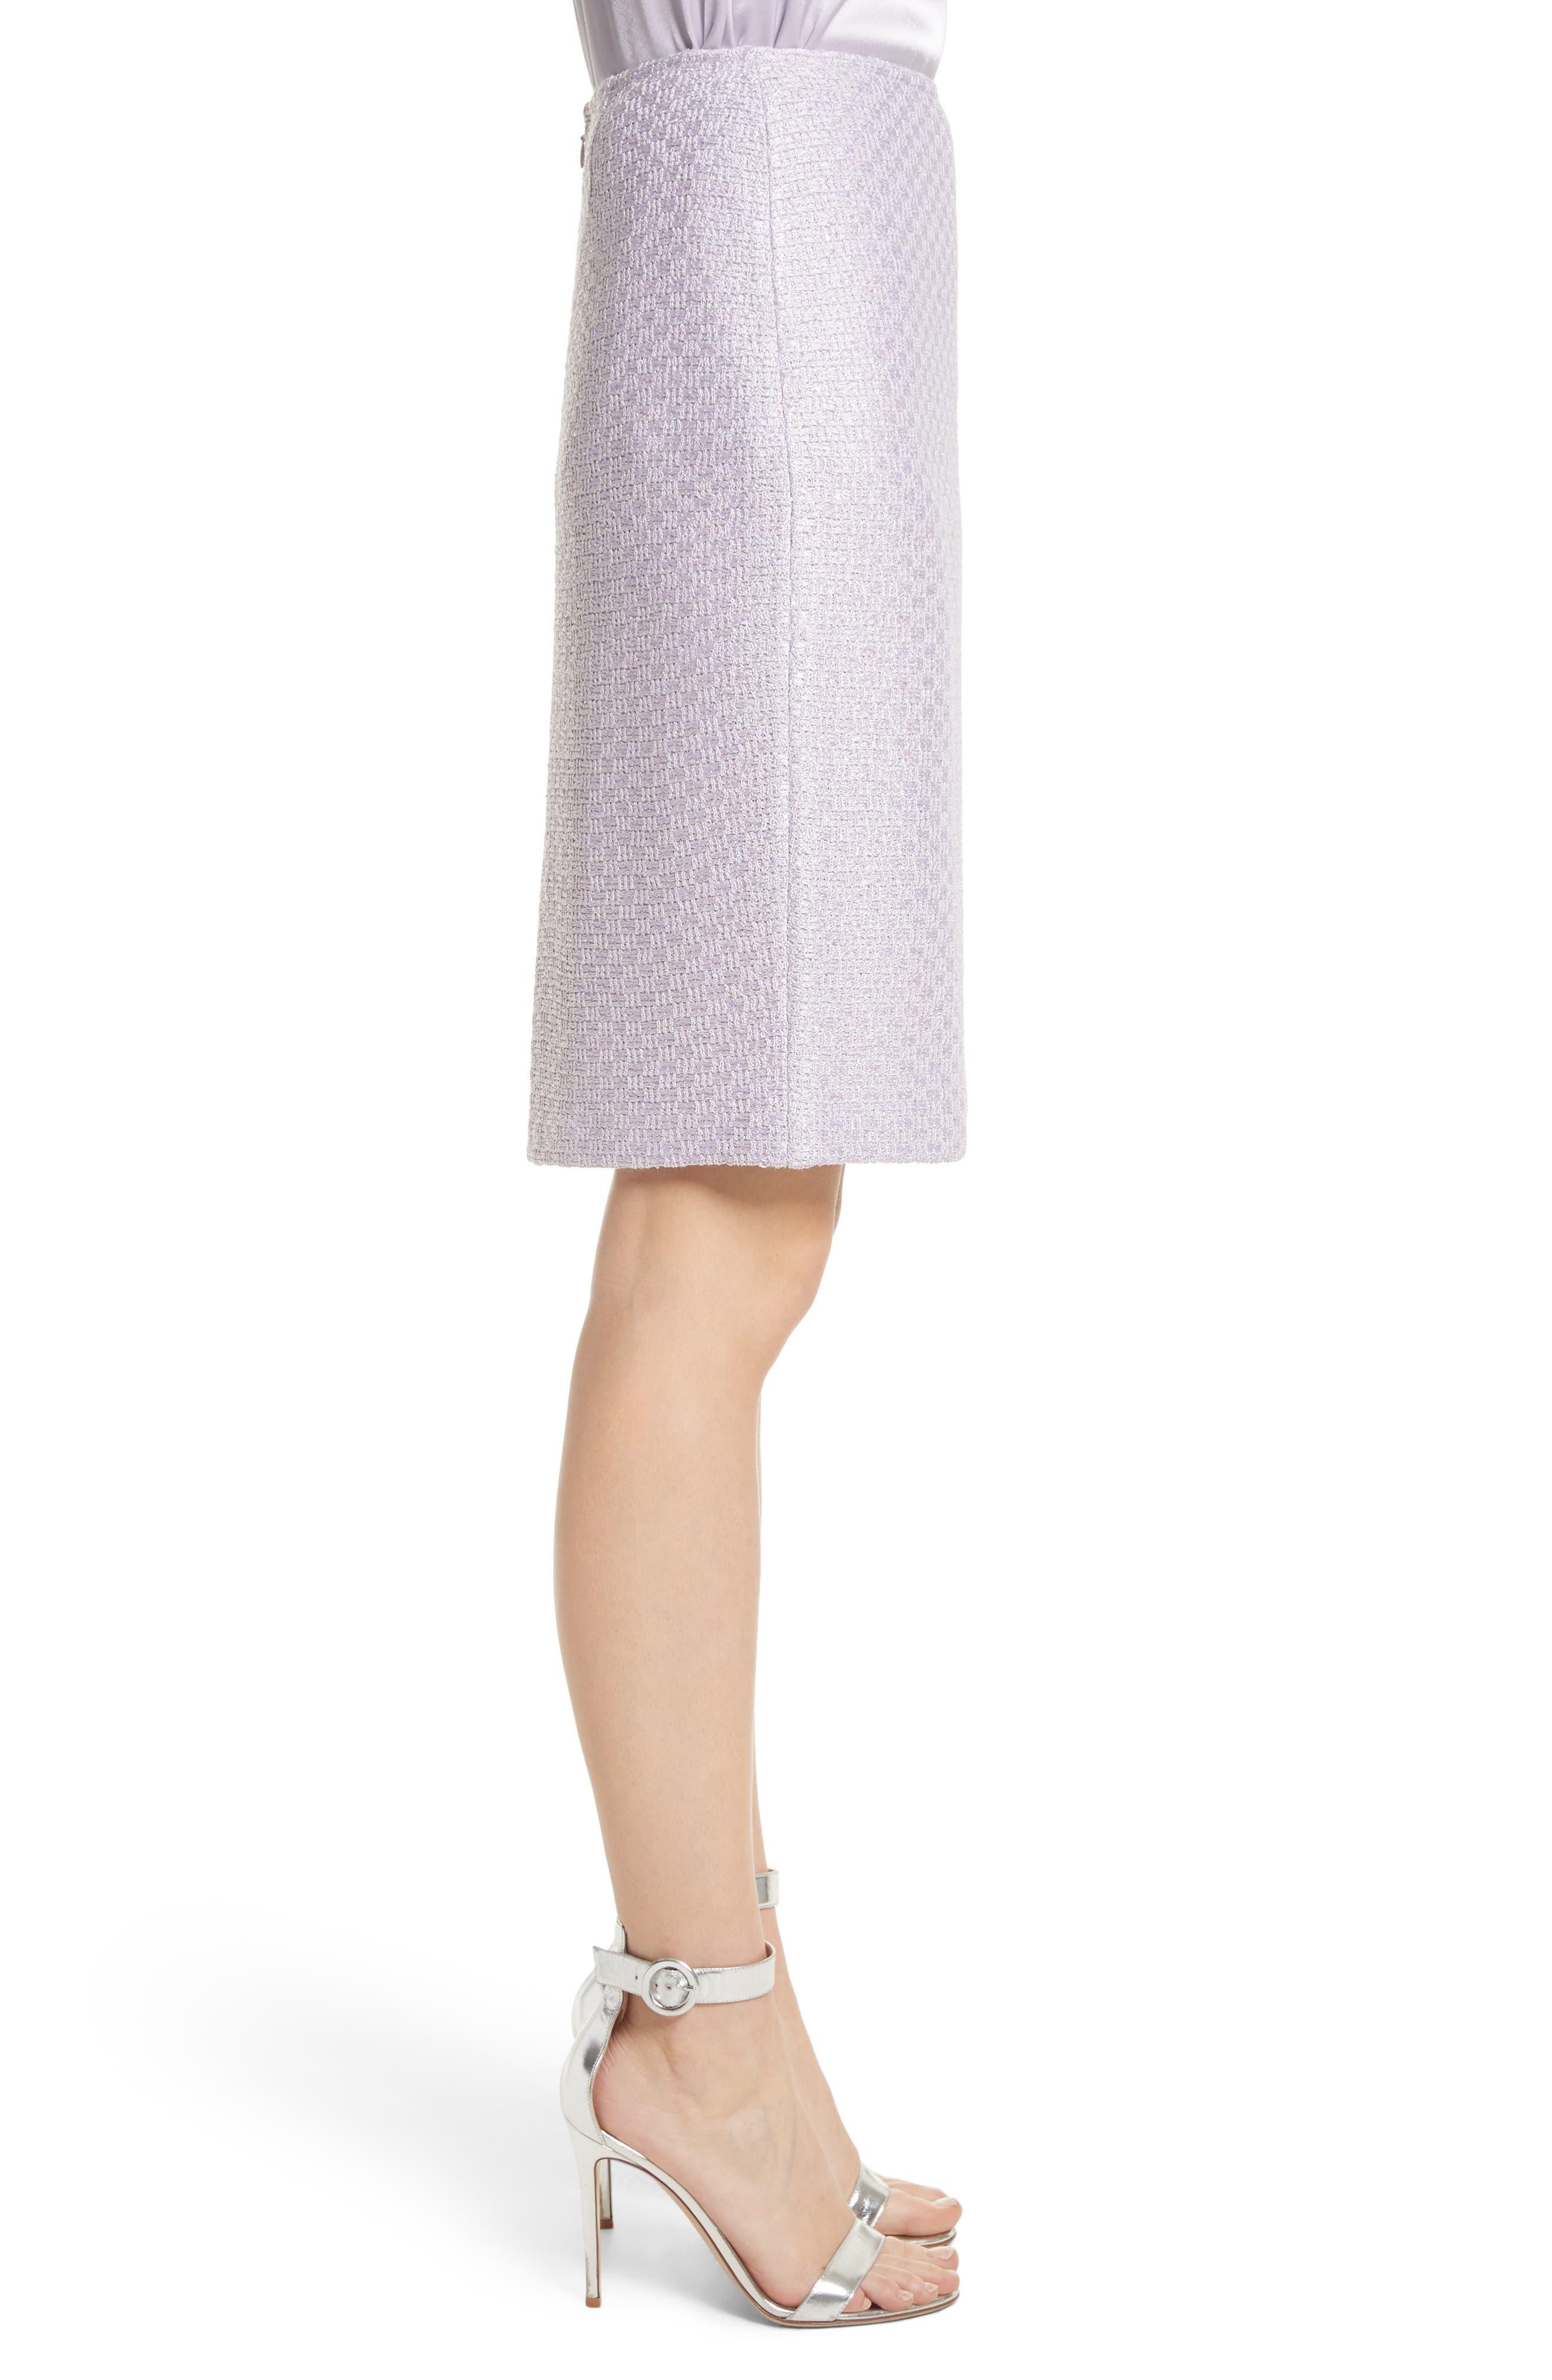 Hansh Sequin Knit Pencil Skirt,                             Alternate thumbnail 3, color,